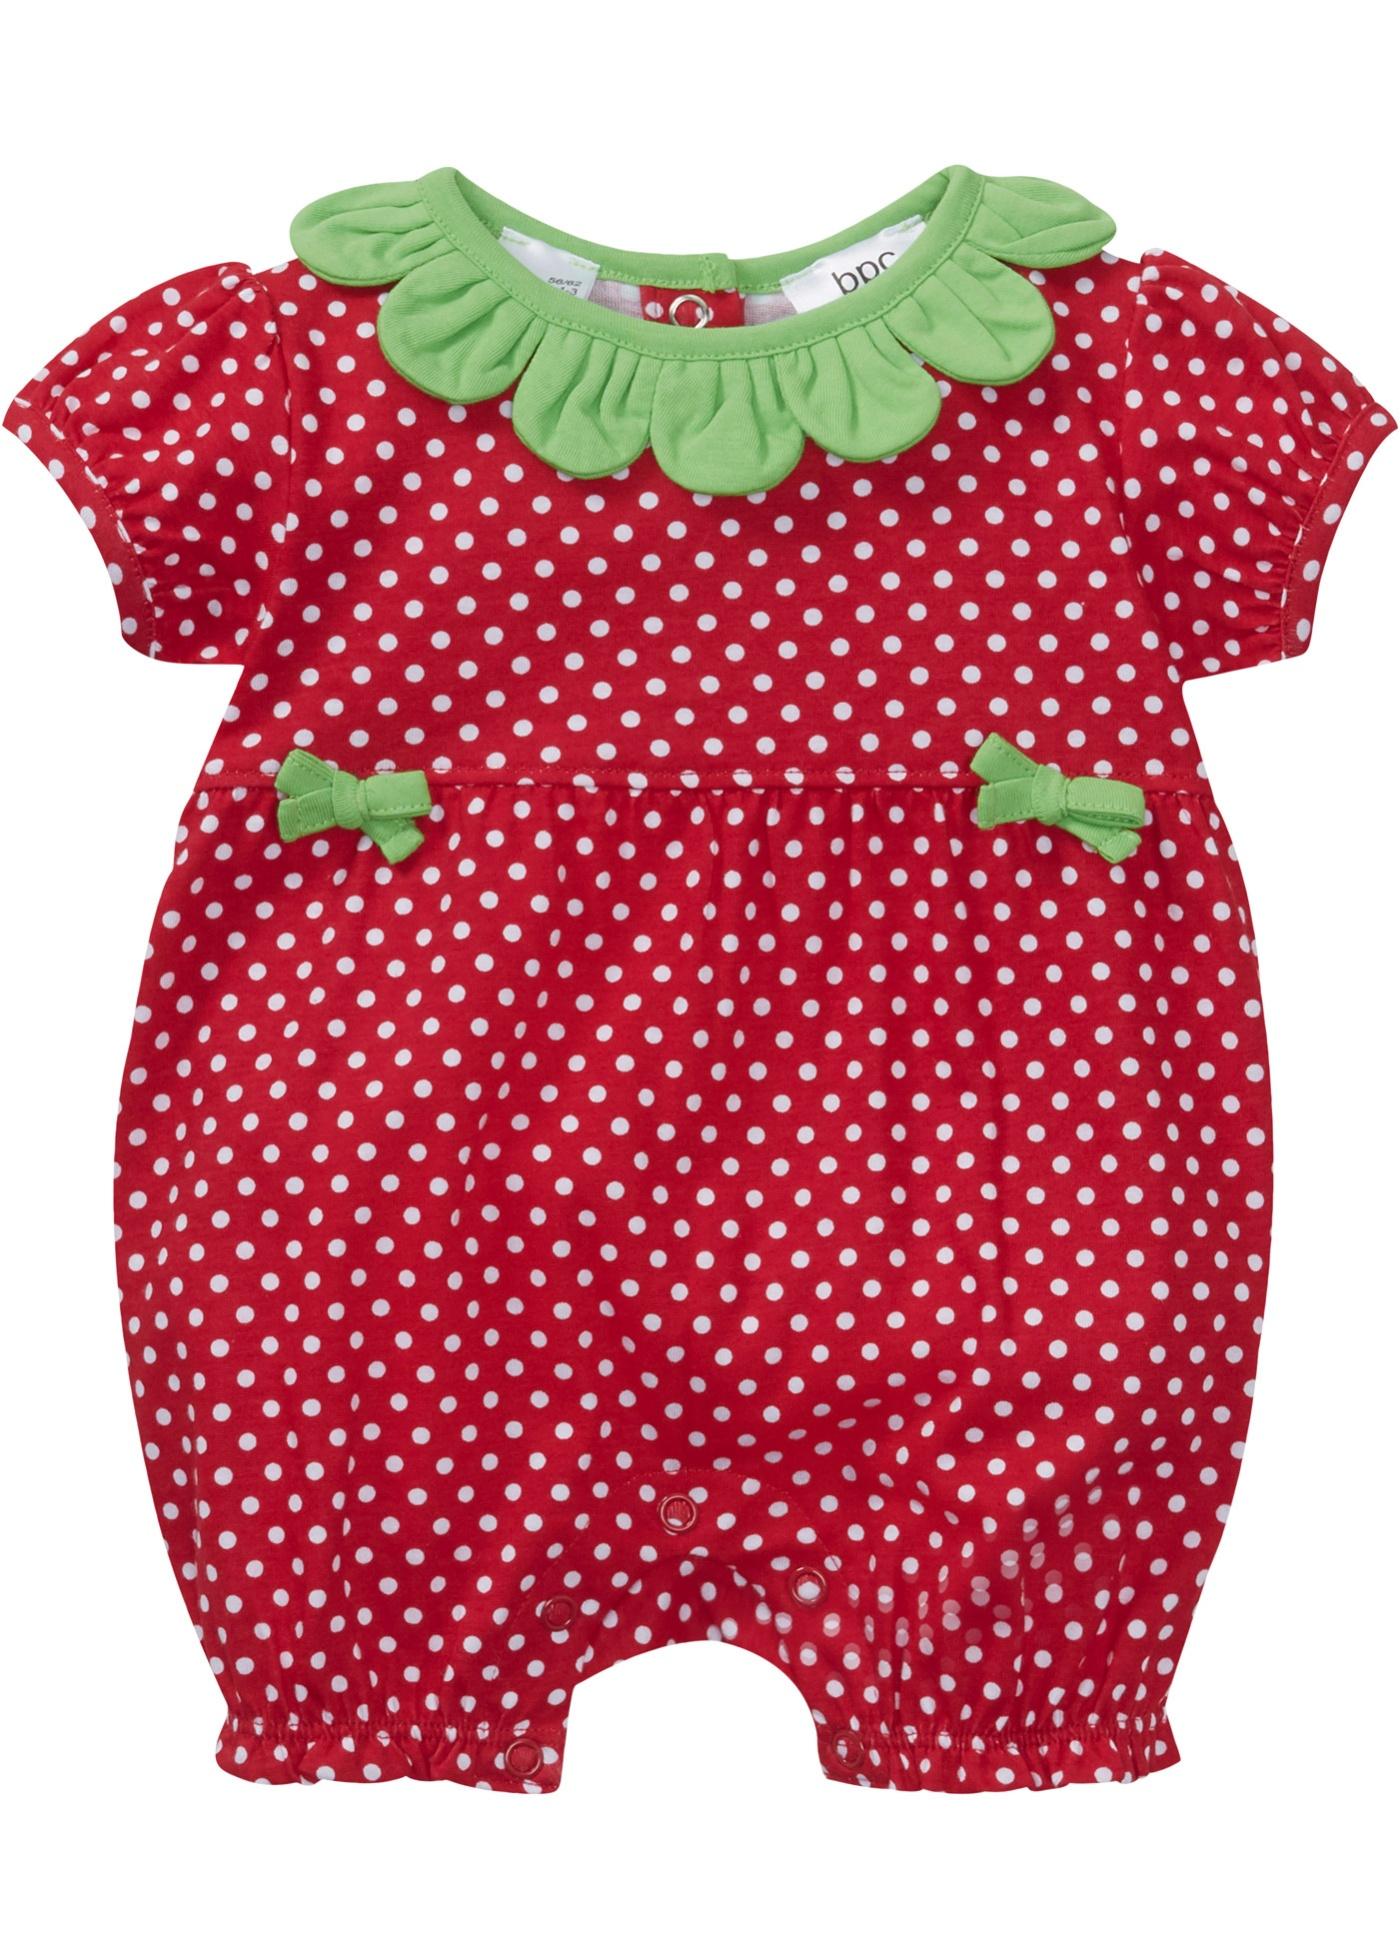 Image of Baby Kurzarm Overall Bio-Baumwolle